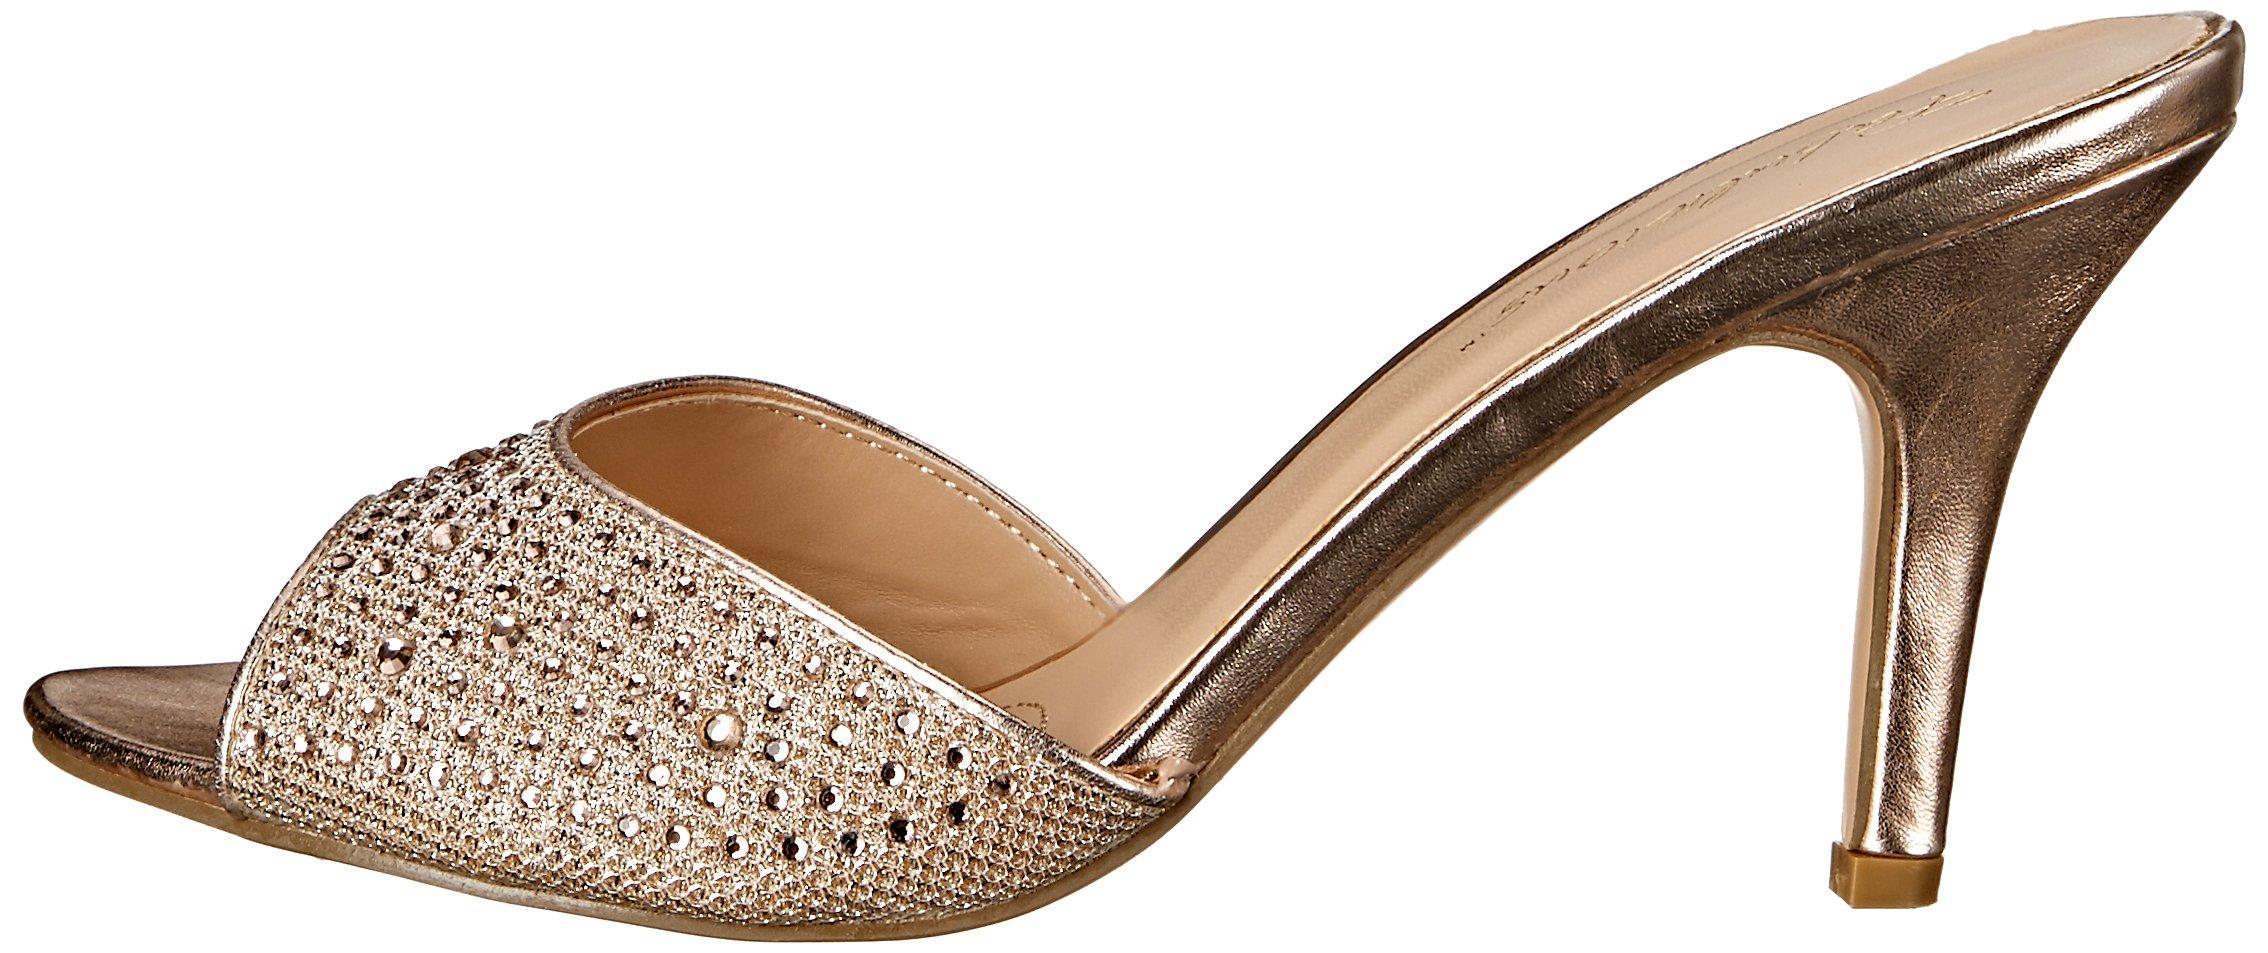 Fabulicious Women's LUCY01/Ggfa Dress Sandal, Gold Glitter Mesh Fabric, 9 M US by Fabulicious (Image #5)